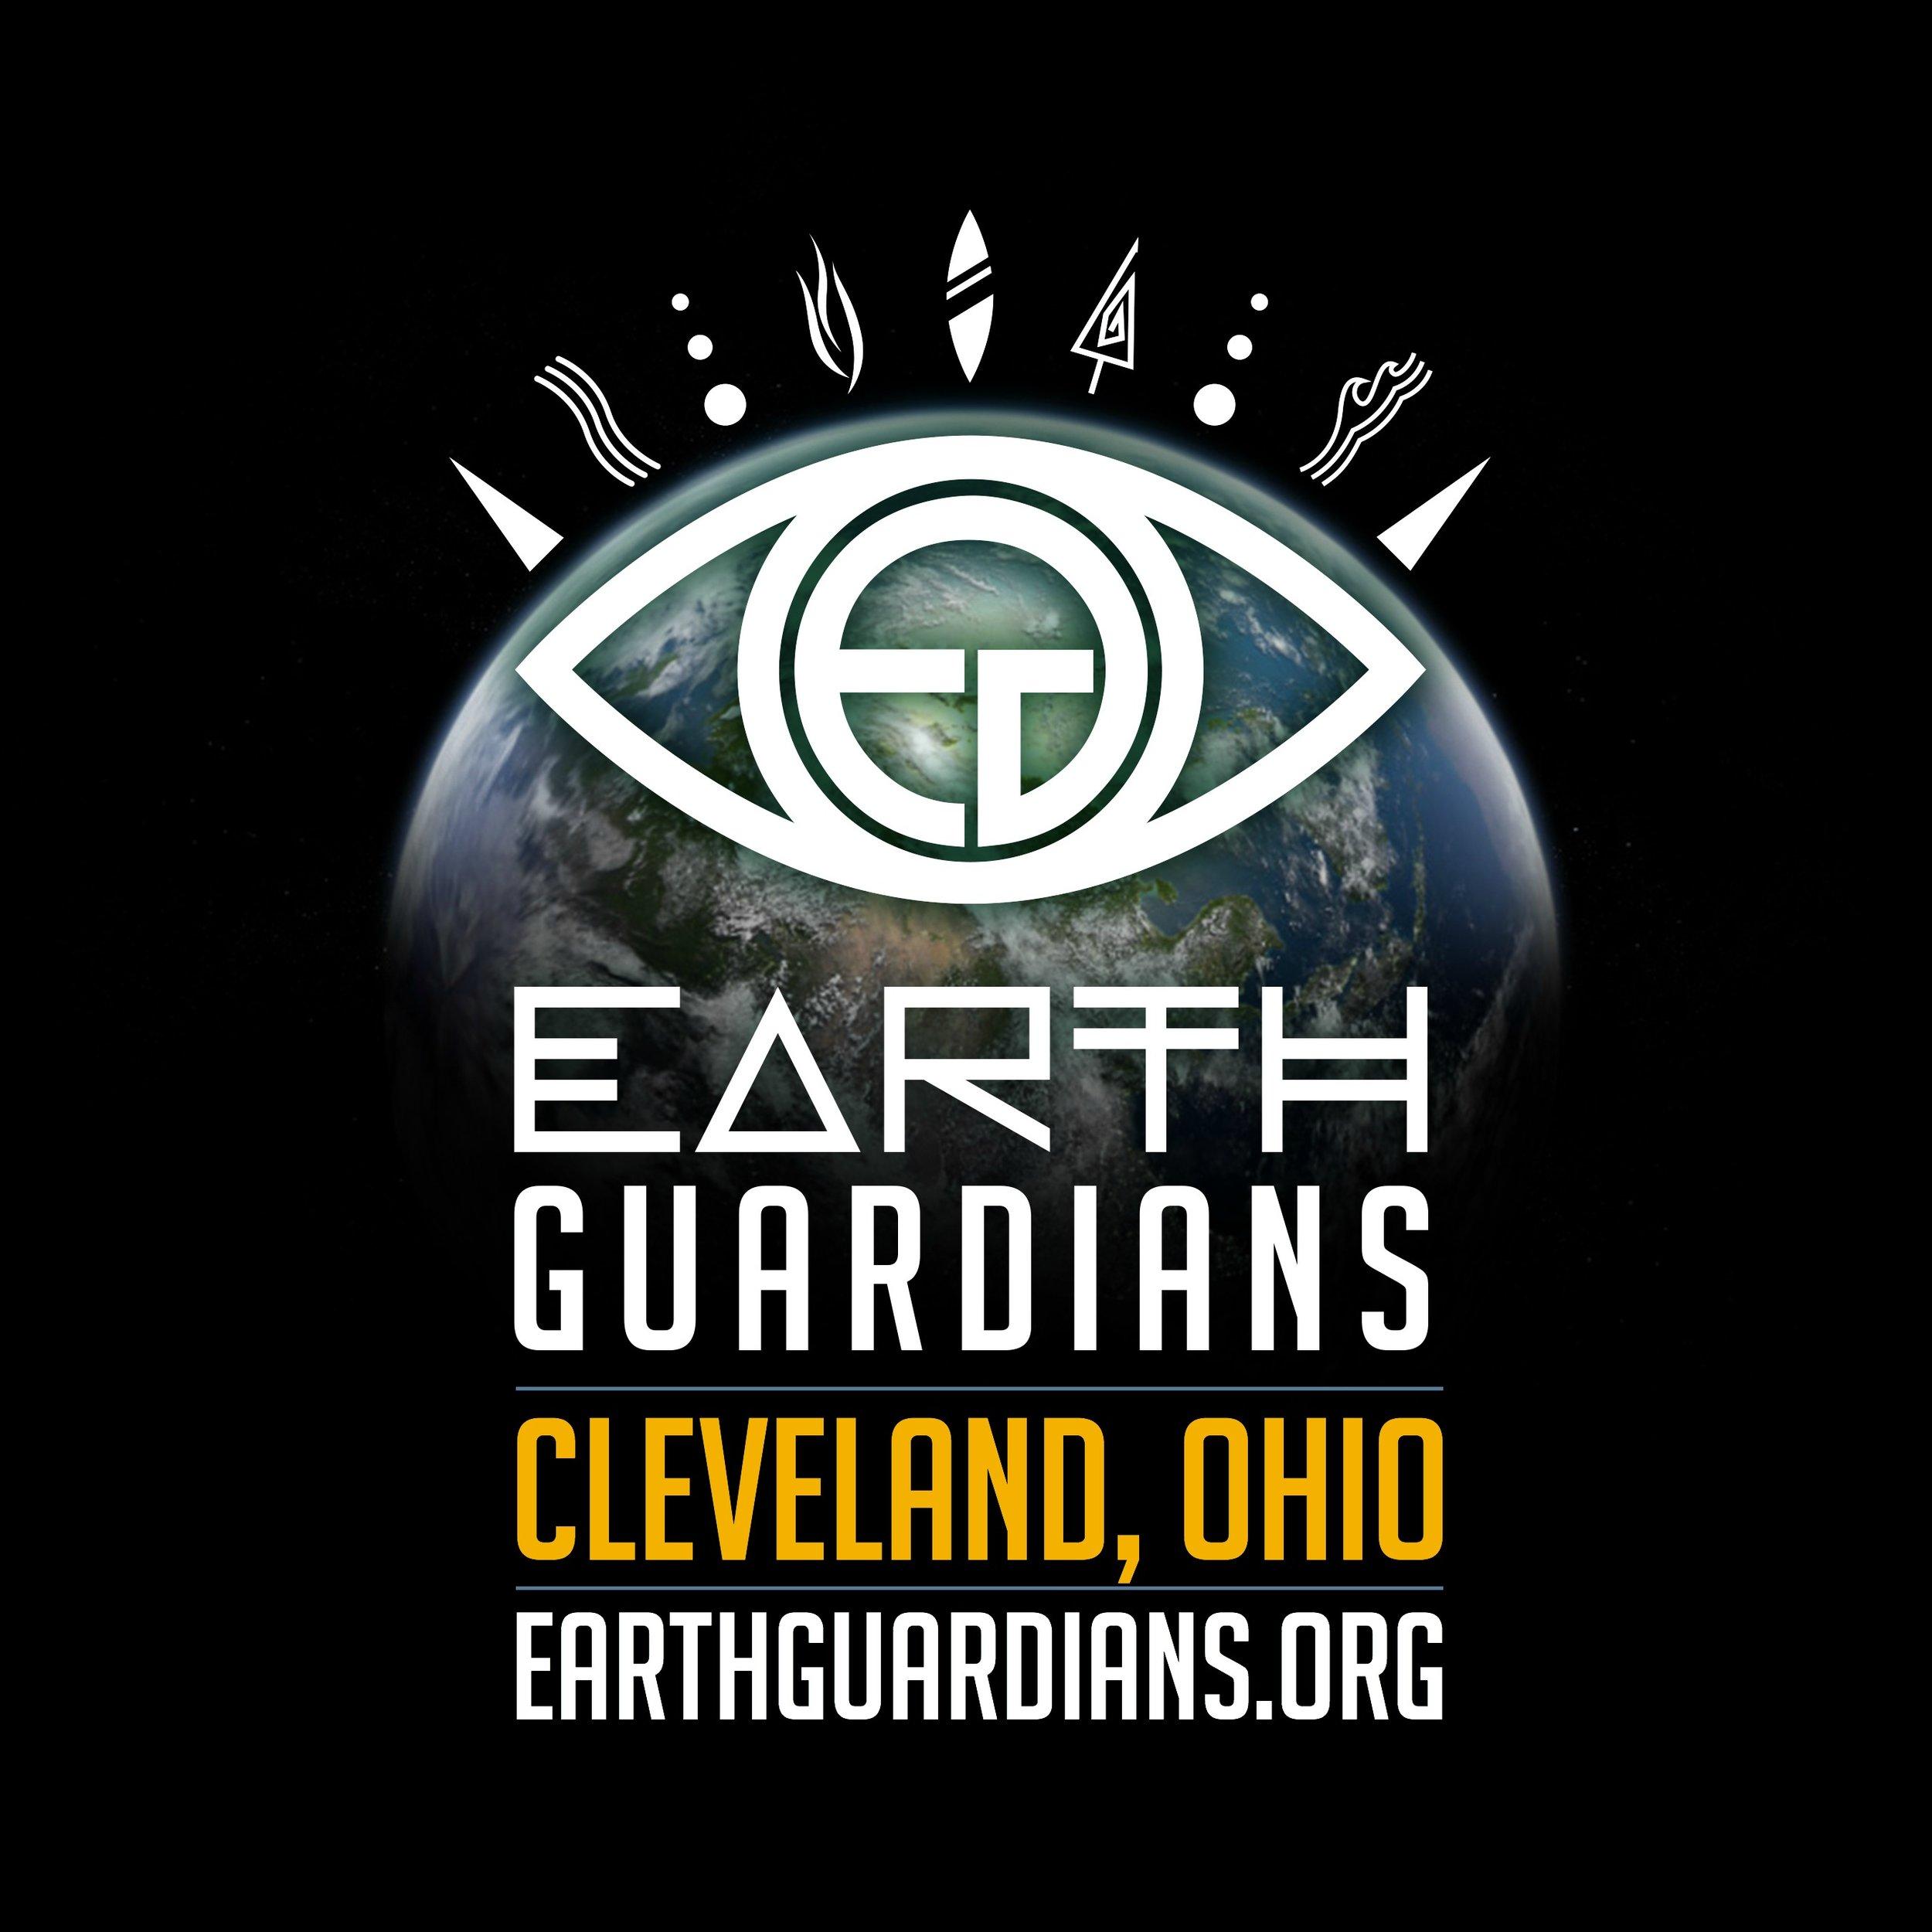 EG_crew logo CLEVELAND.jpg